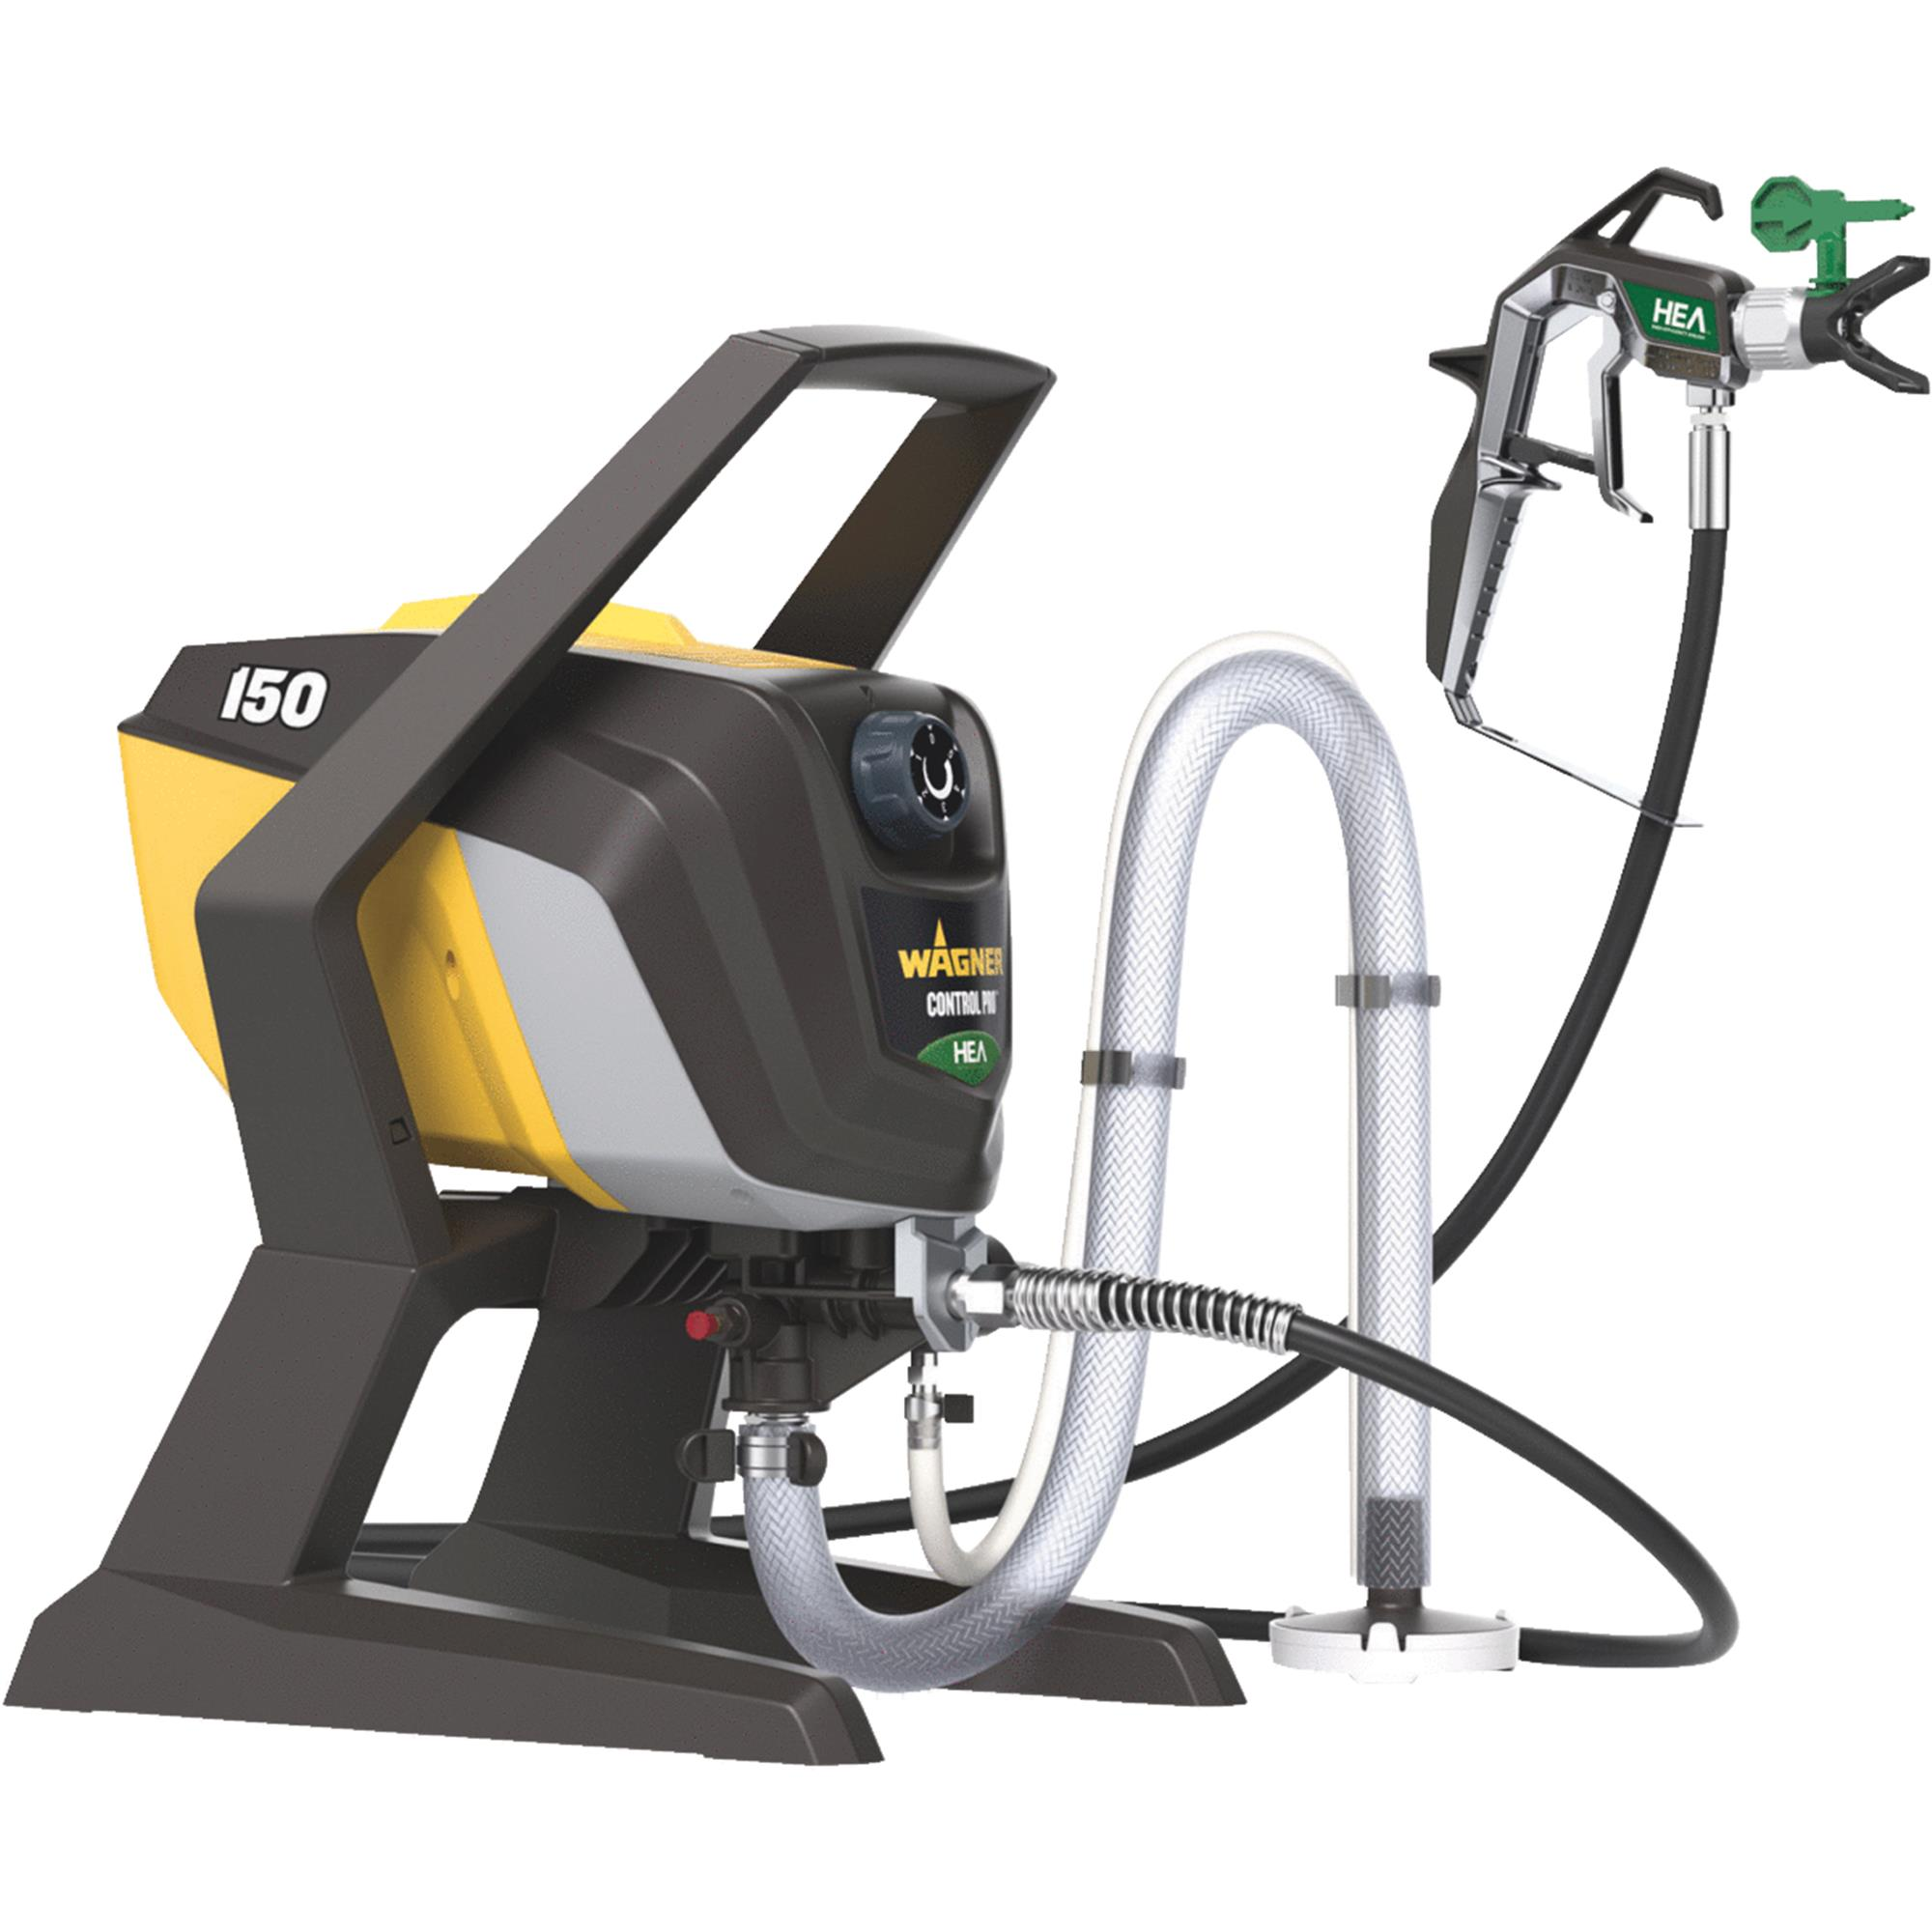 Wagner Control Pro 150 HEA Sprayer